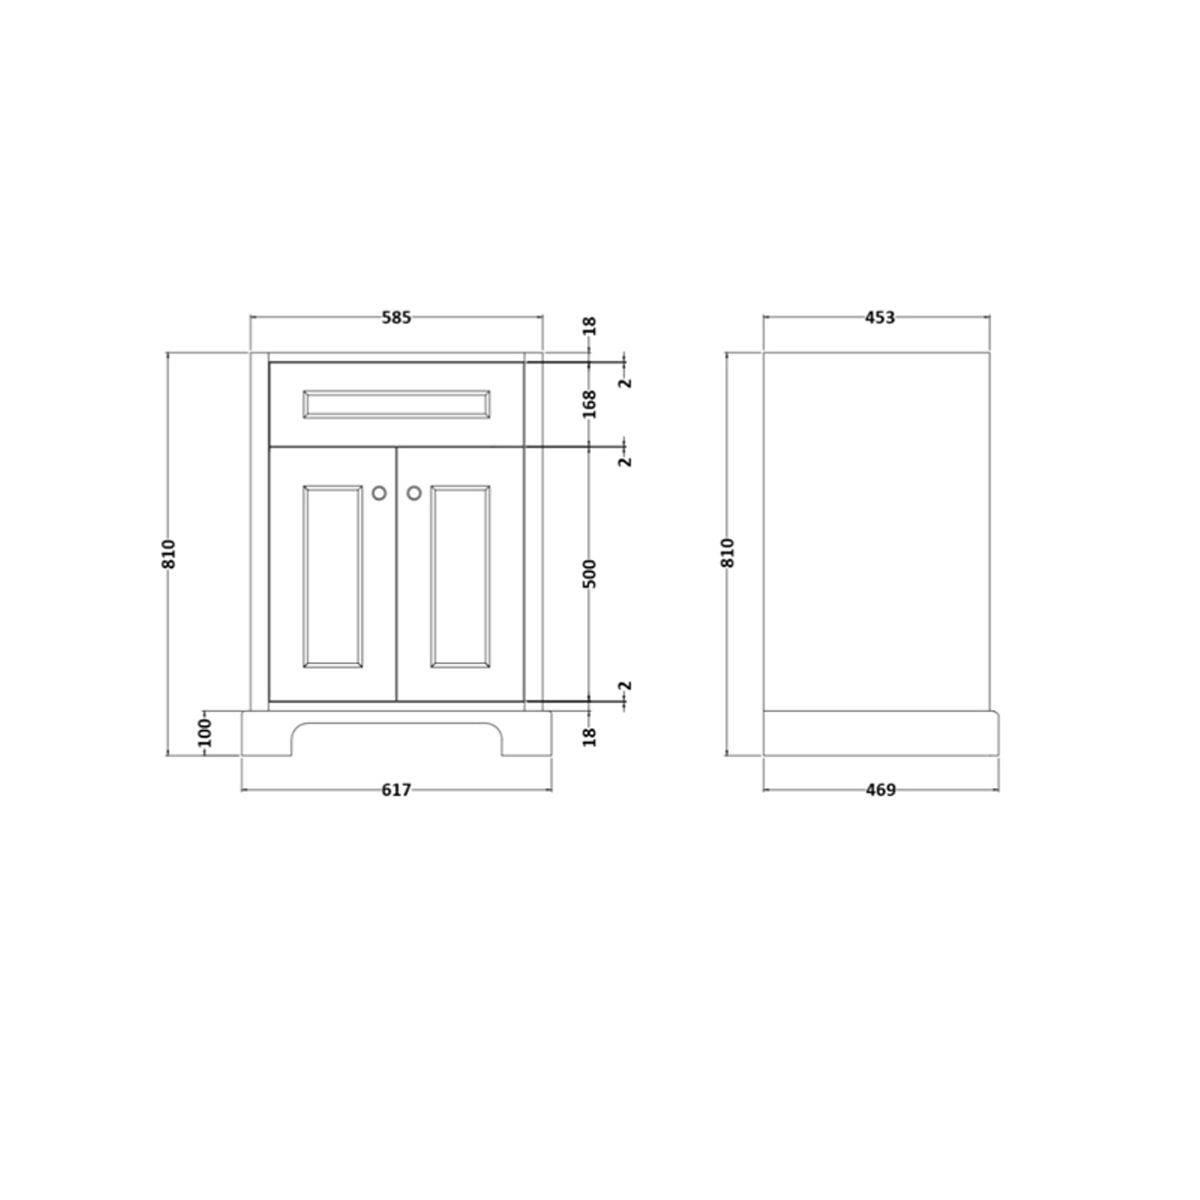 RAK Washington Grey Vanity Unit with Grey Countertop 600mm Measurements